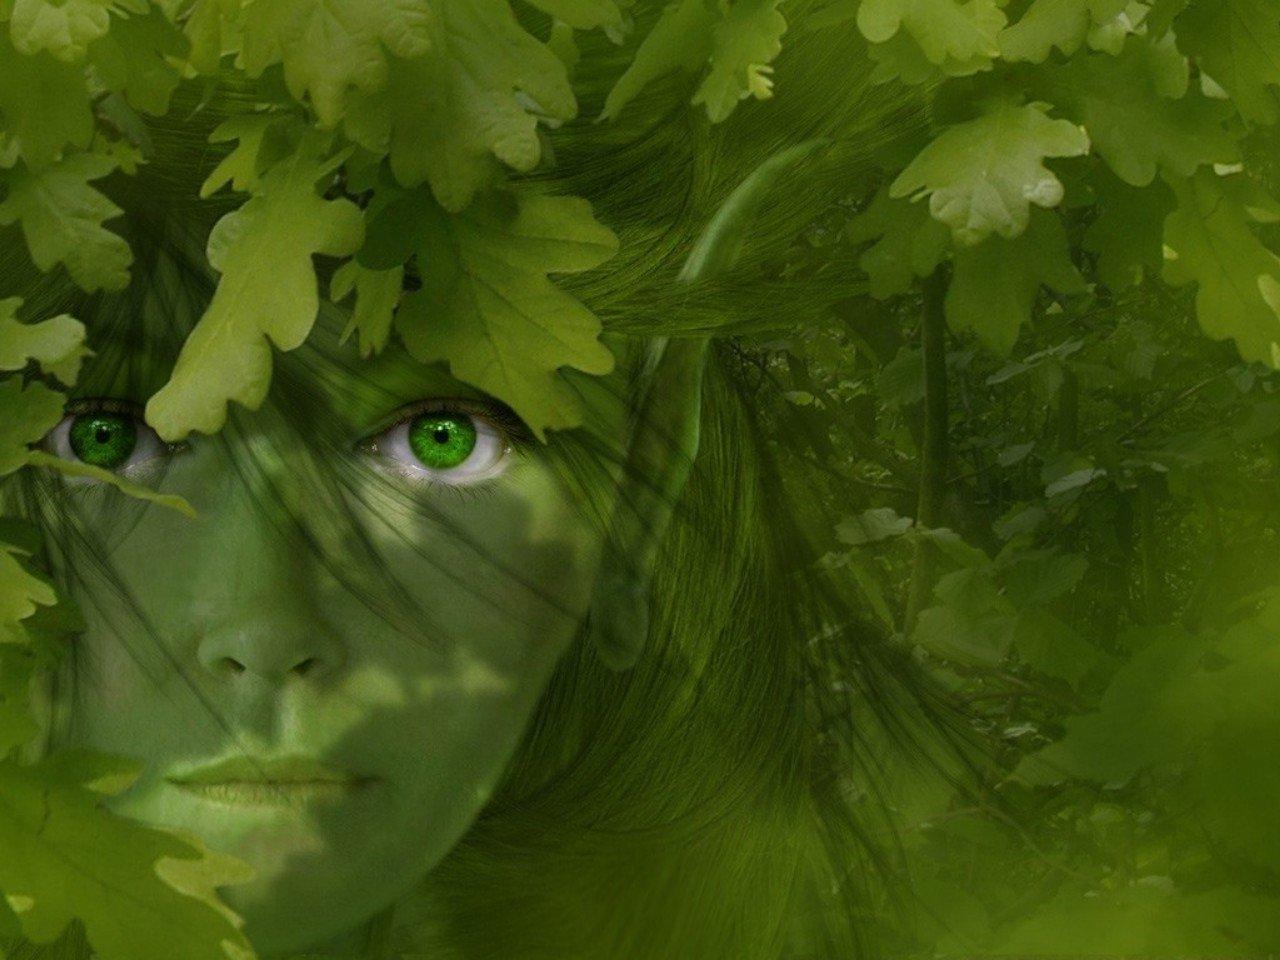 Green Eyes Computer Wallpapers Desktop Backgrounds 1280x960